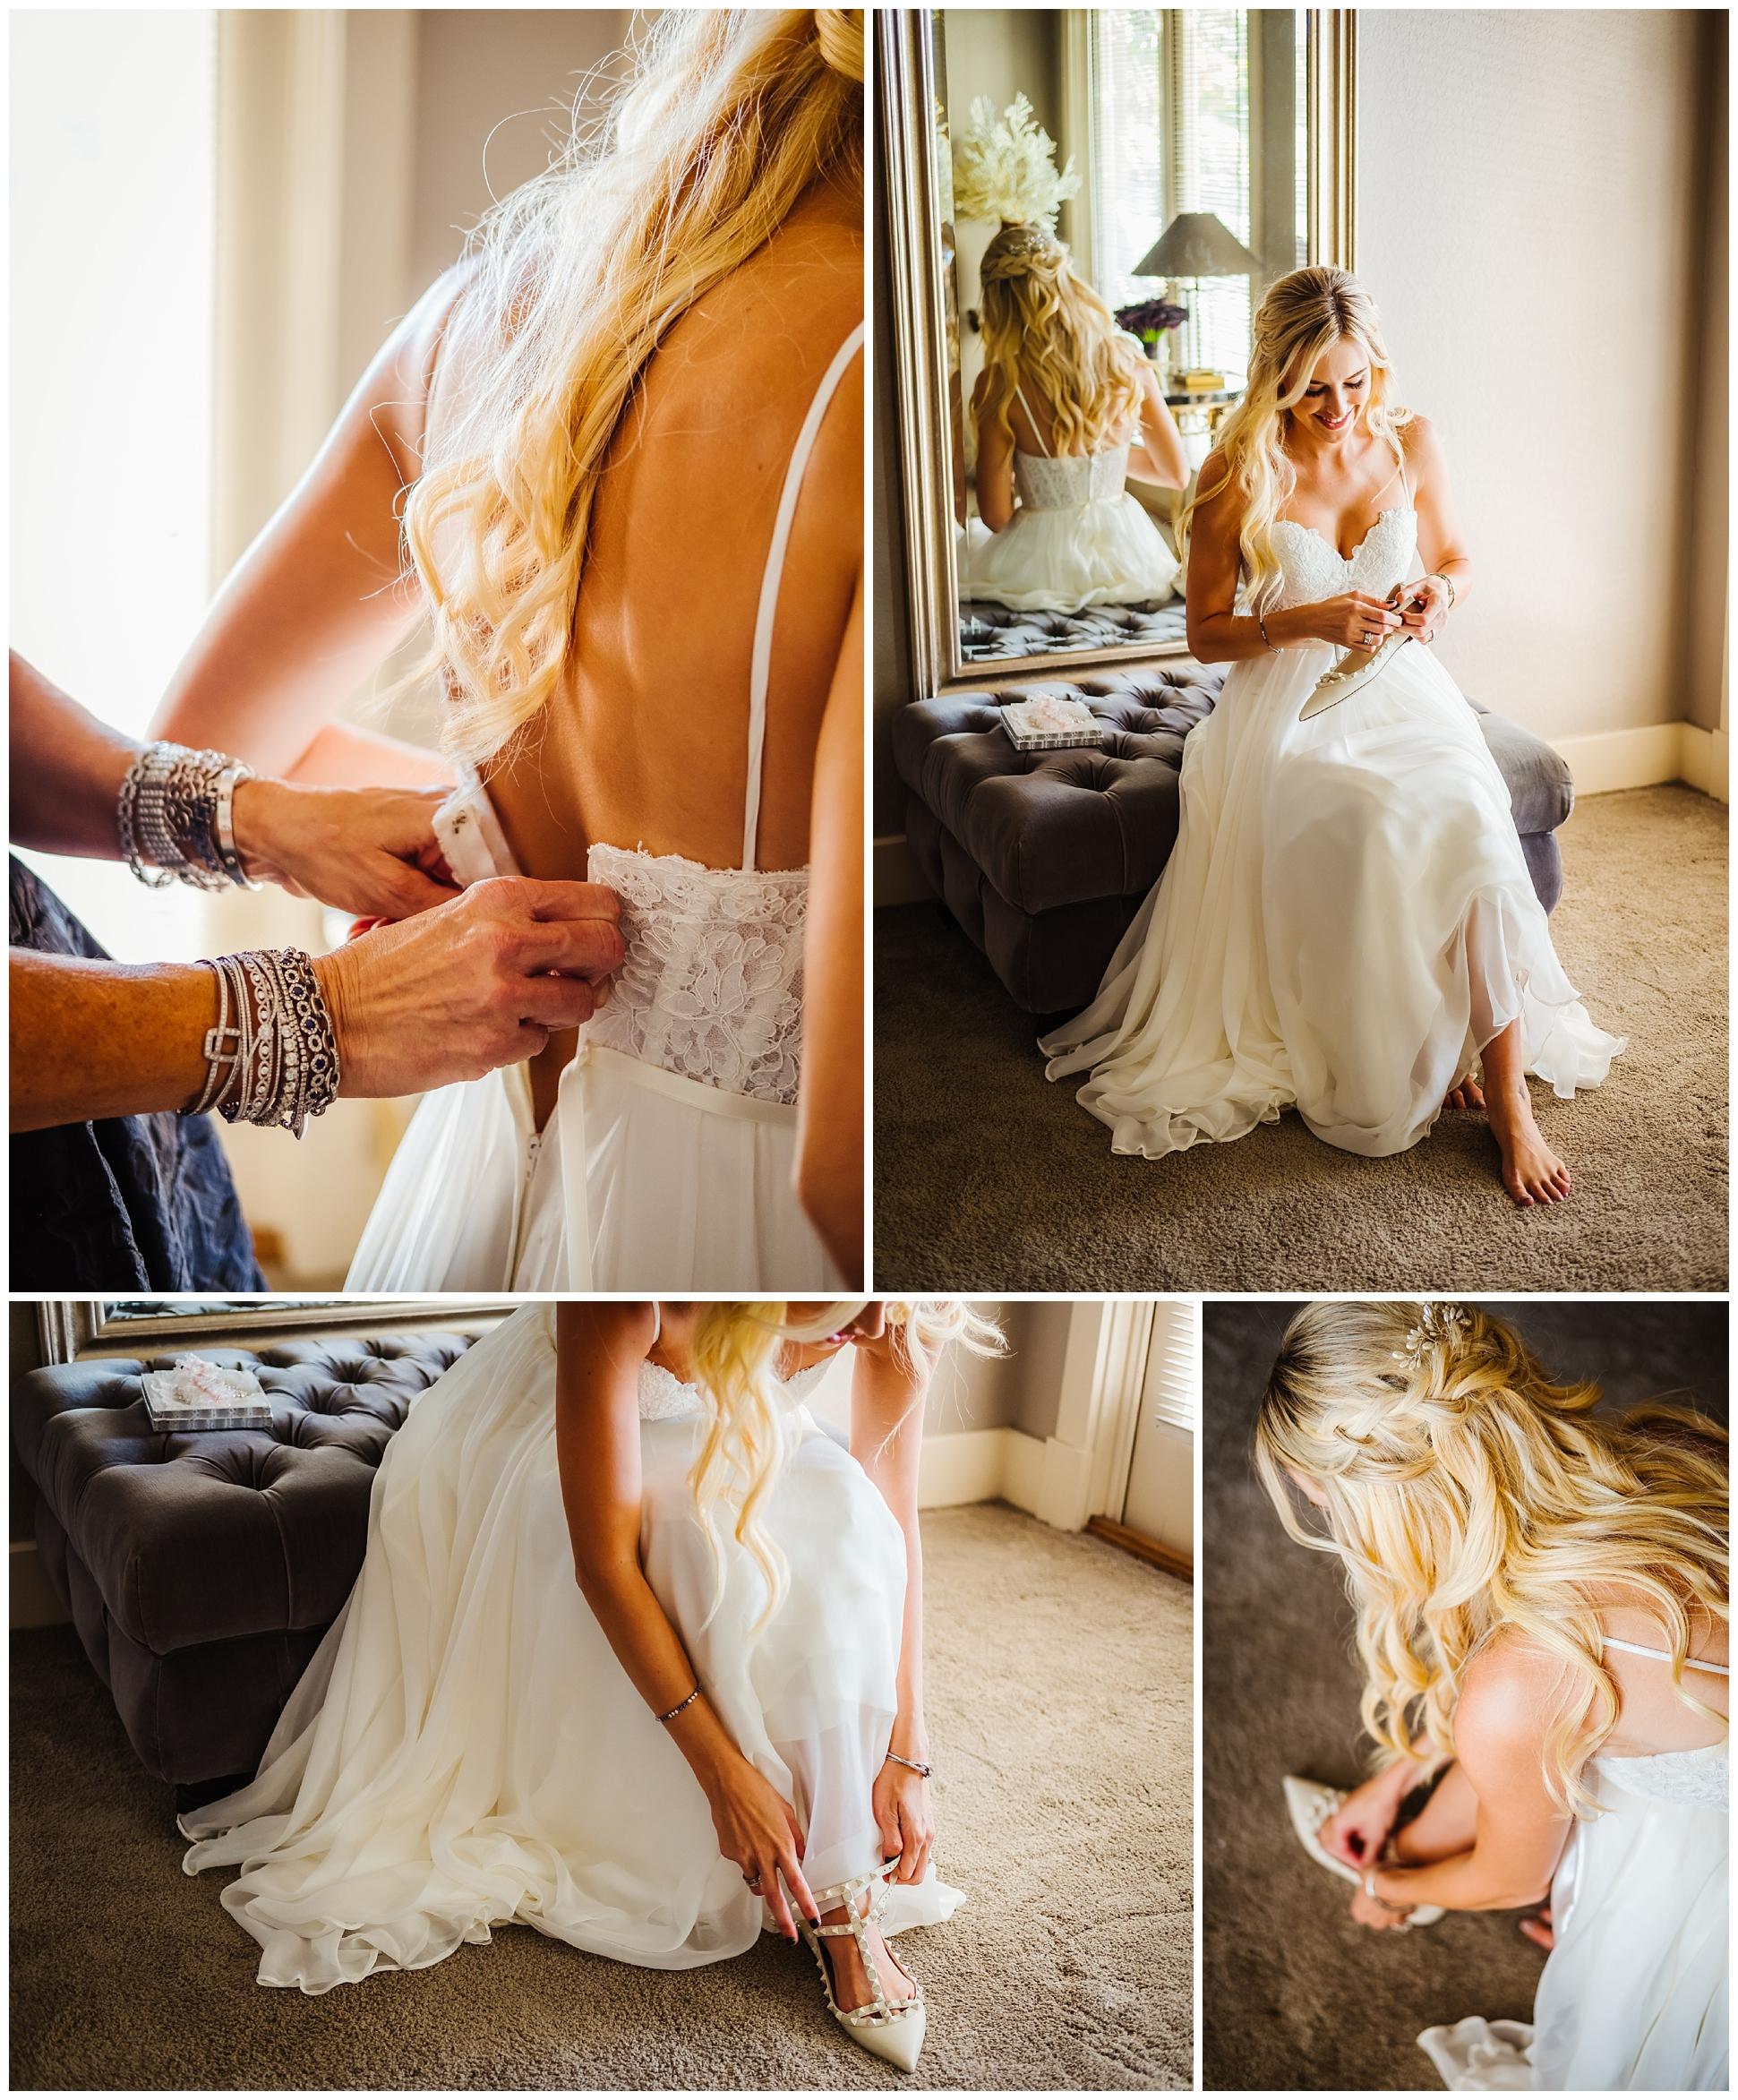 st-pete-wedding-photographer-backyard-luxury-snell-isle-vinoy_0009.jpg